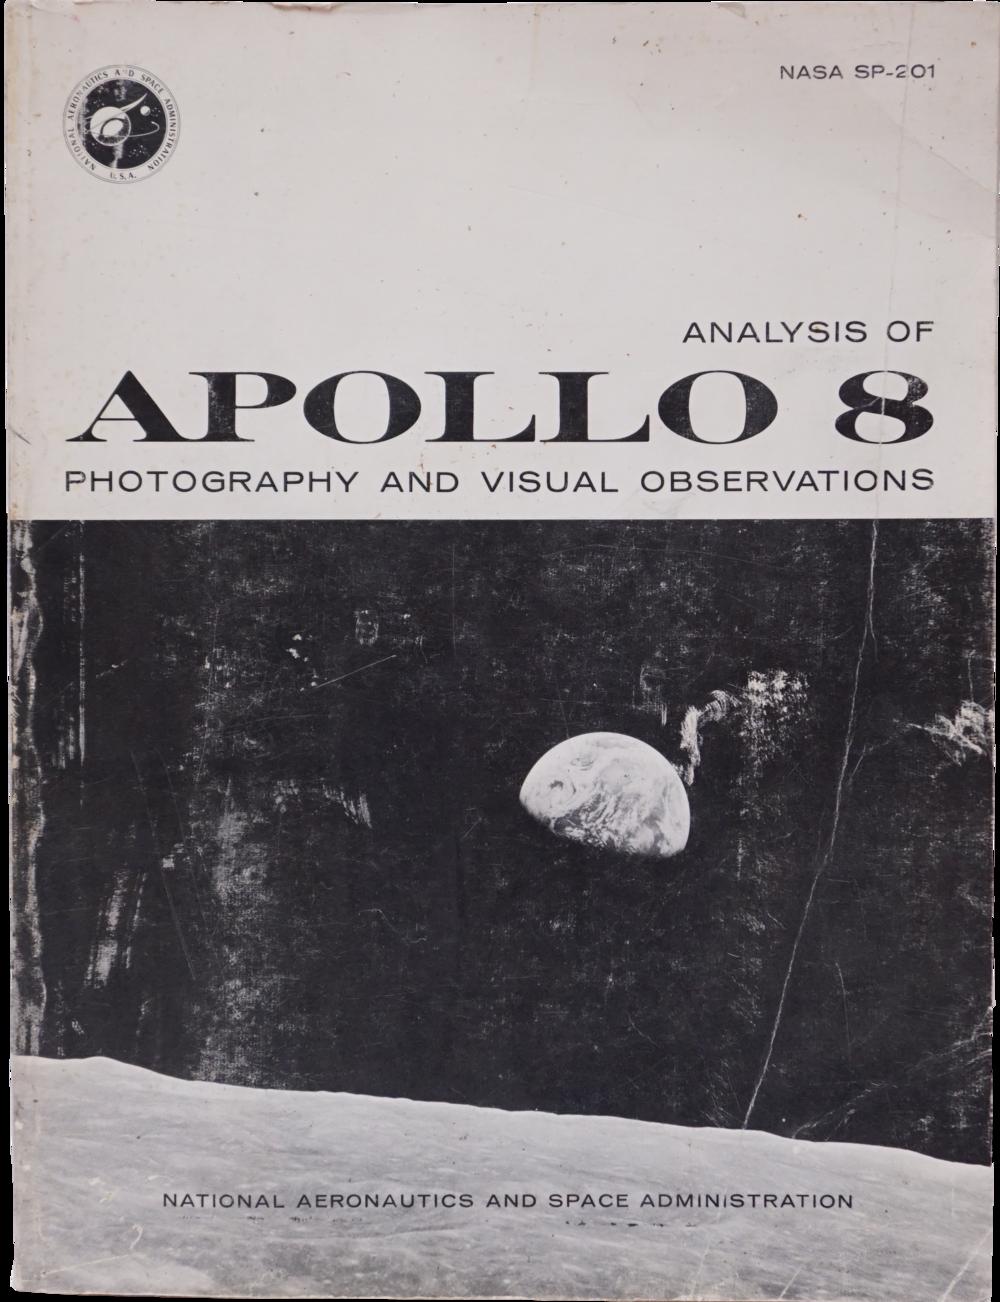 ERM-XXXX-BOOK-ANALYSIS_OF_APOLLO_8_PHOTOGRAPHY-NASA-FRONT.png